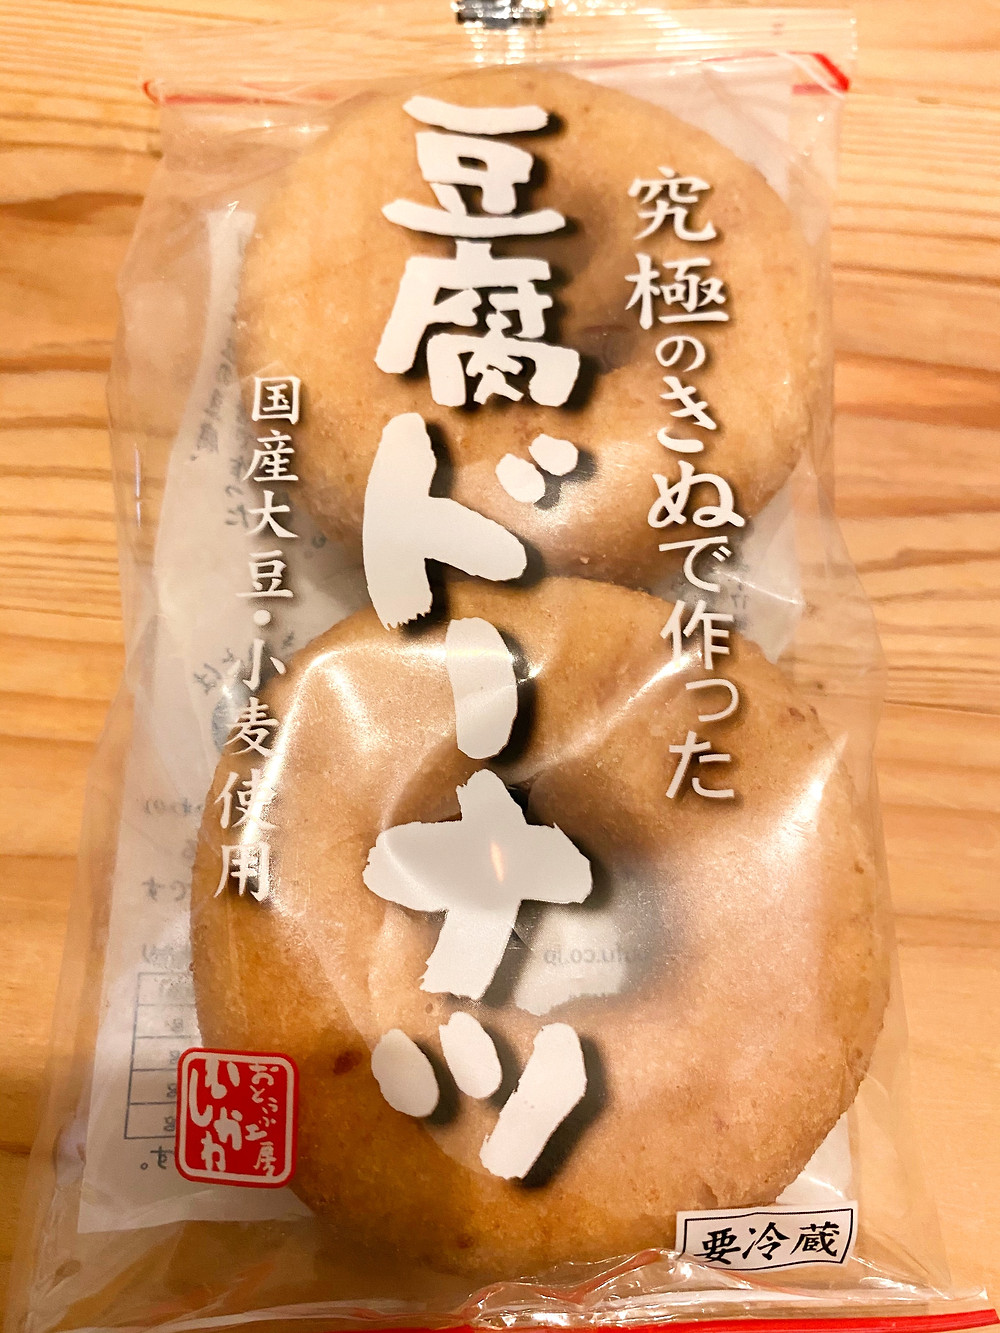 Tofu Donuts Vegan 豆乳ドーナッツ アレルギー反応ドーナッツ